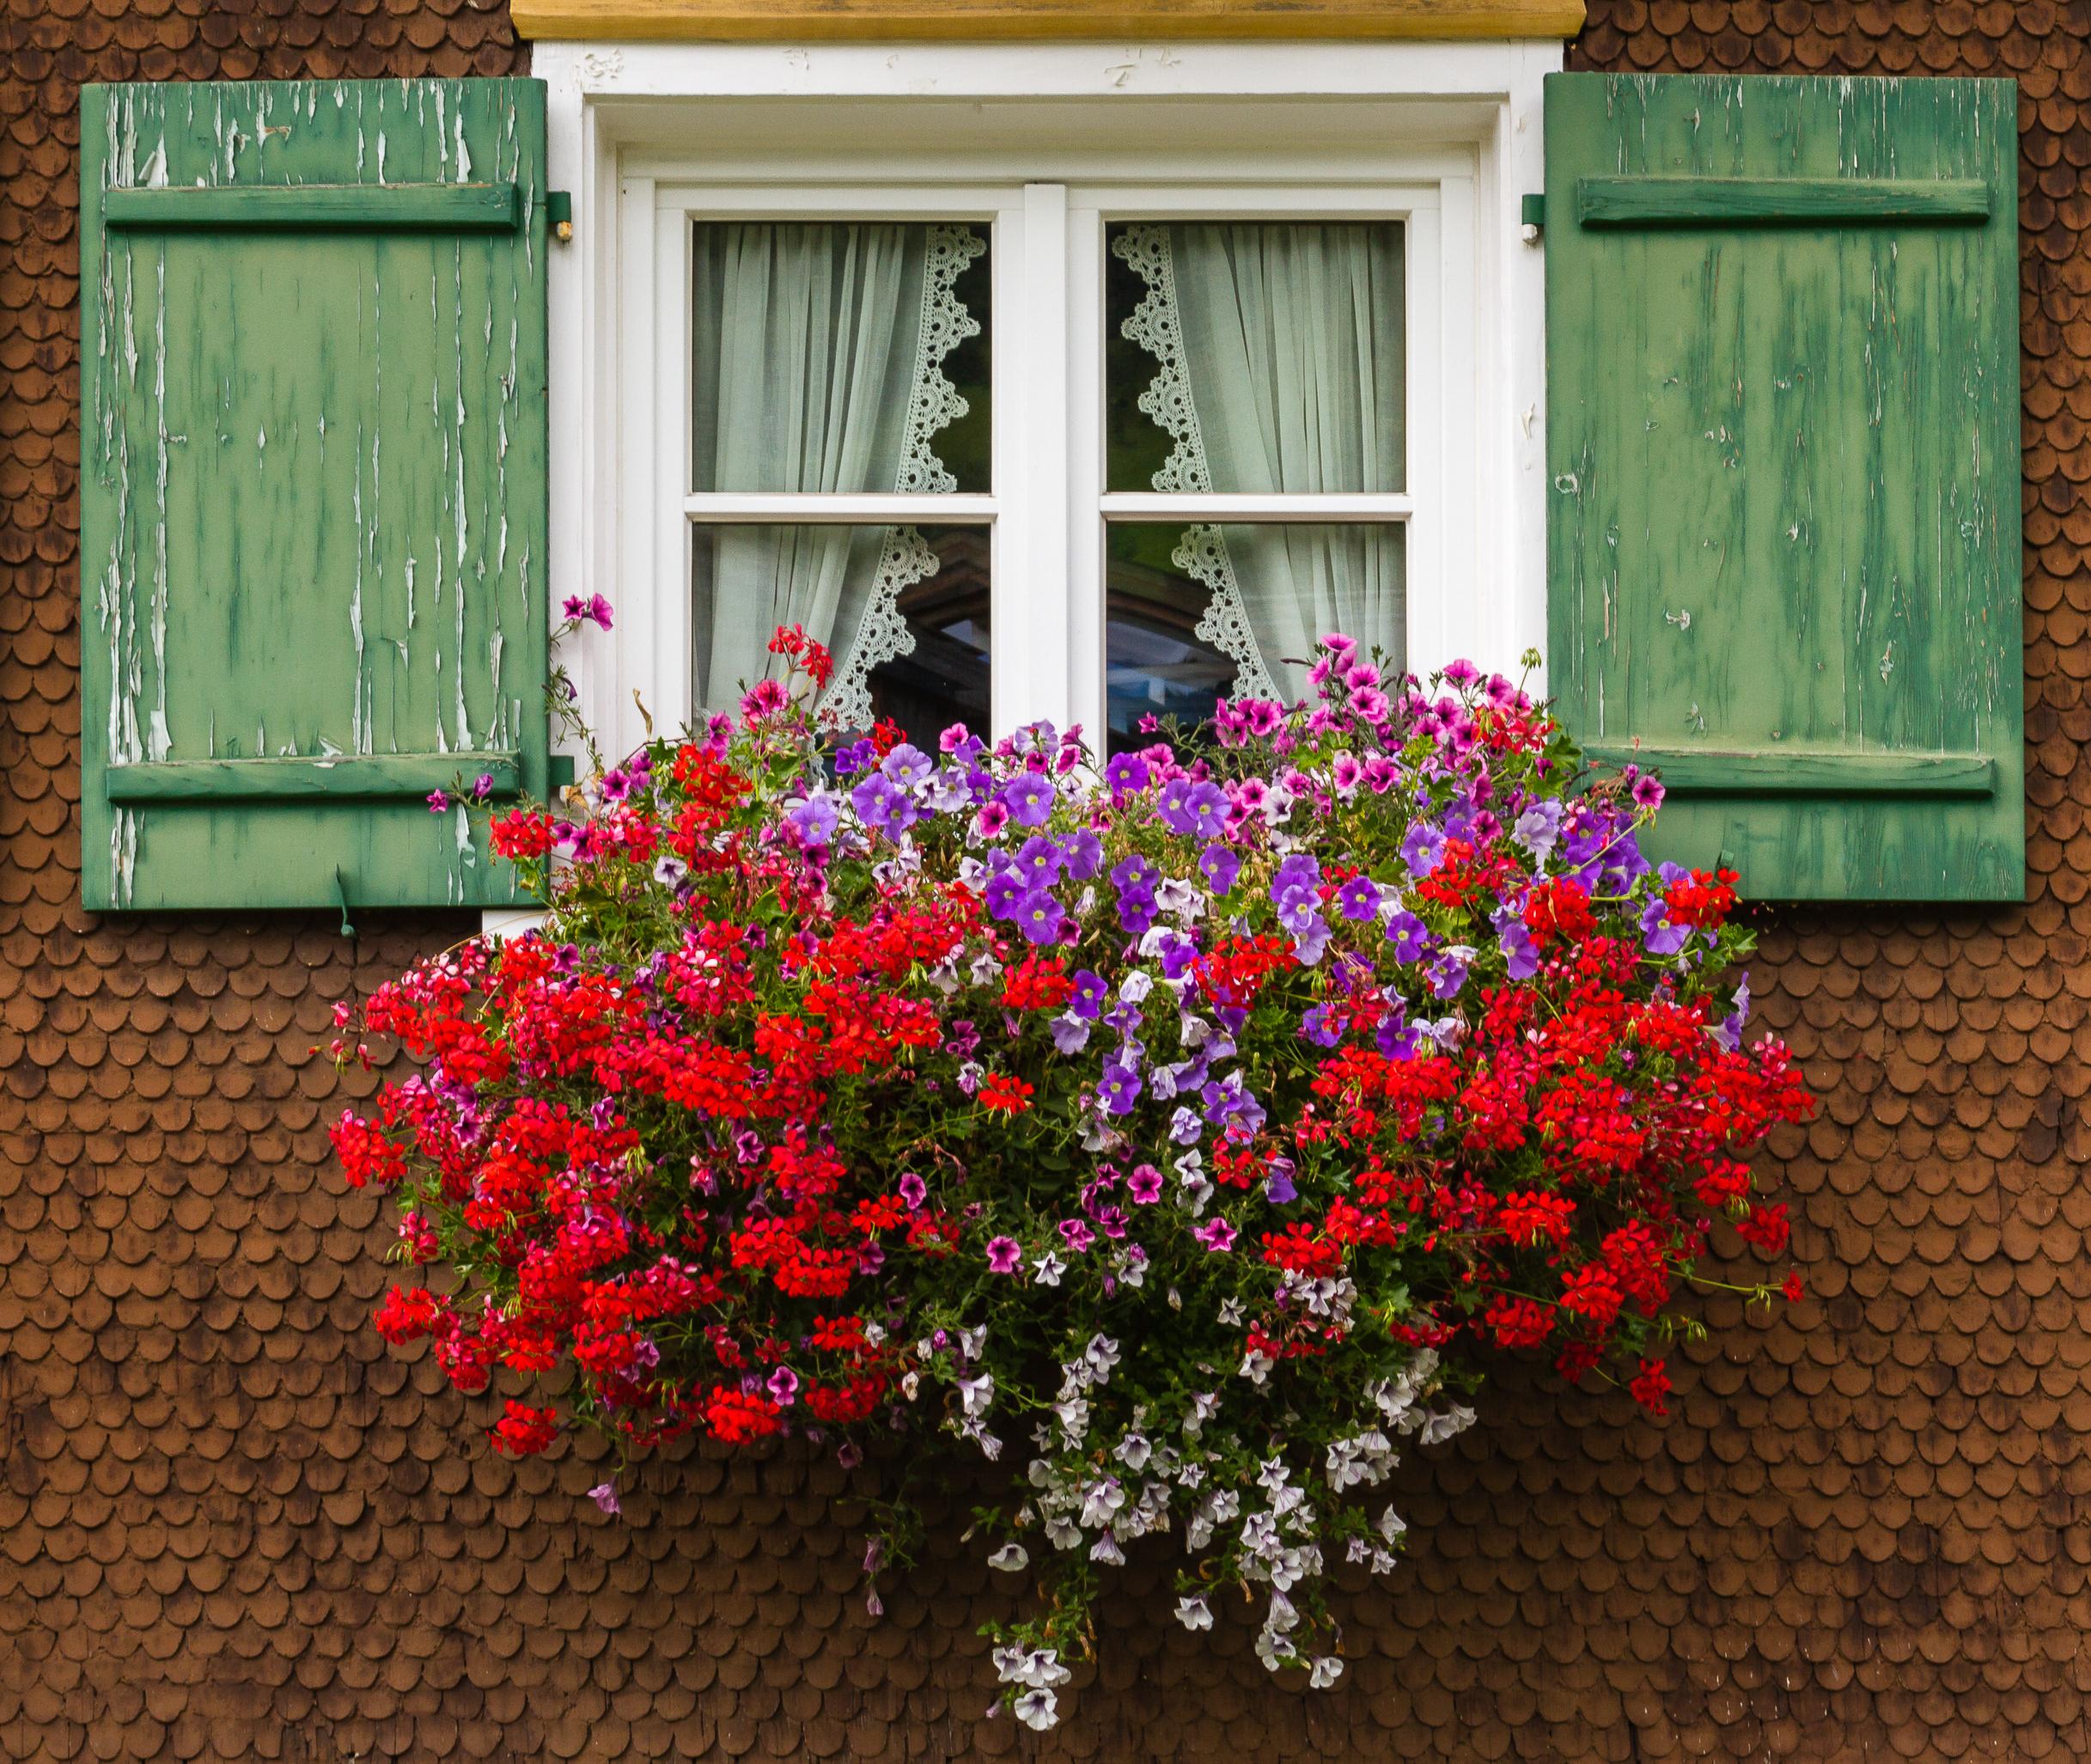 File 2013 09 18 002 Fenster Mit Blumenkasten Jpg Wikimedia Commons